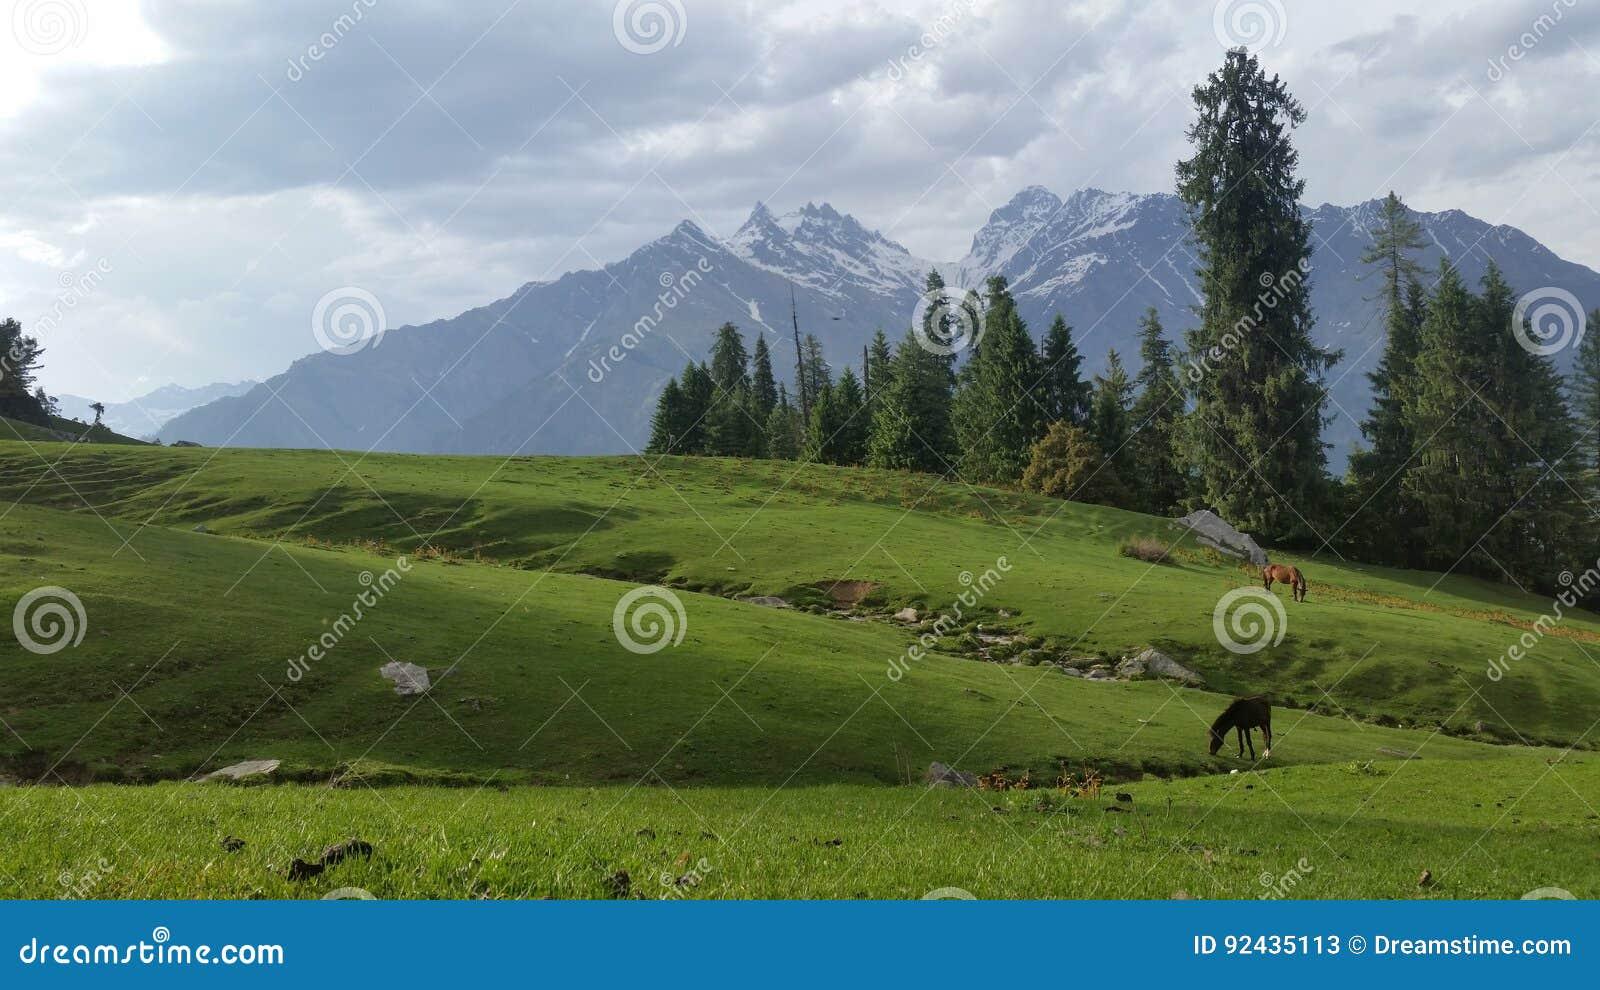 Serene Himalayas